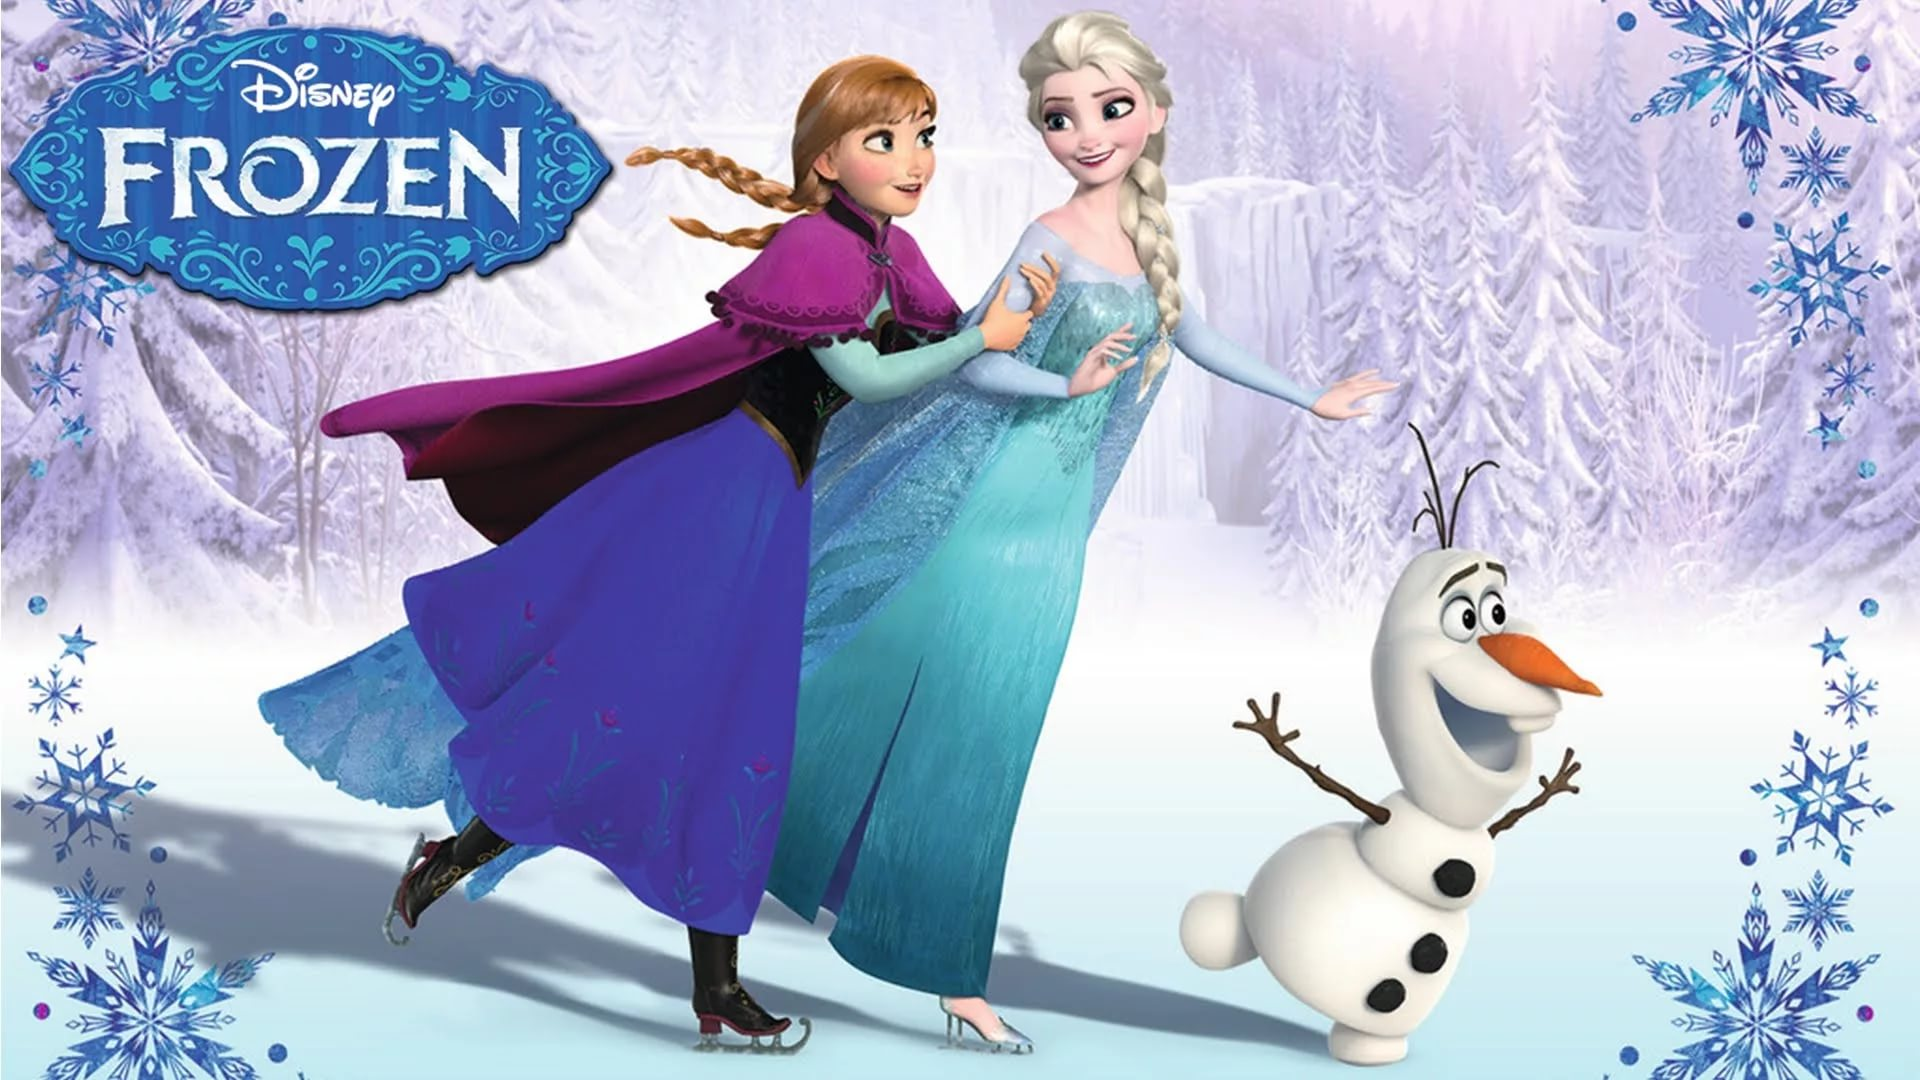 frozen wallpaper,animated cartoon,cartoon,animation,ice skating,snow